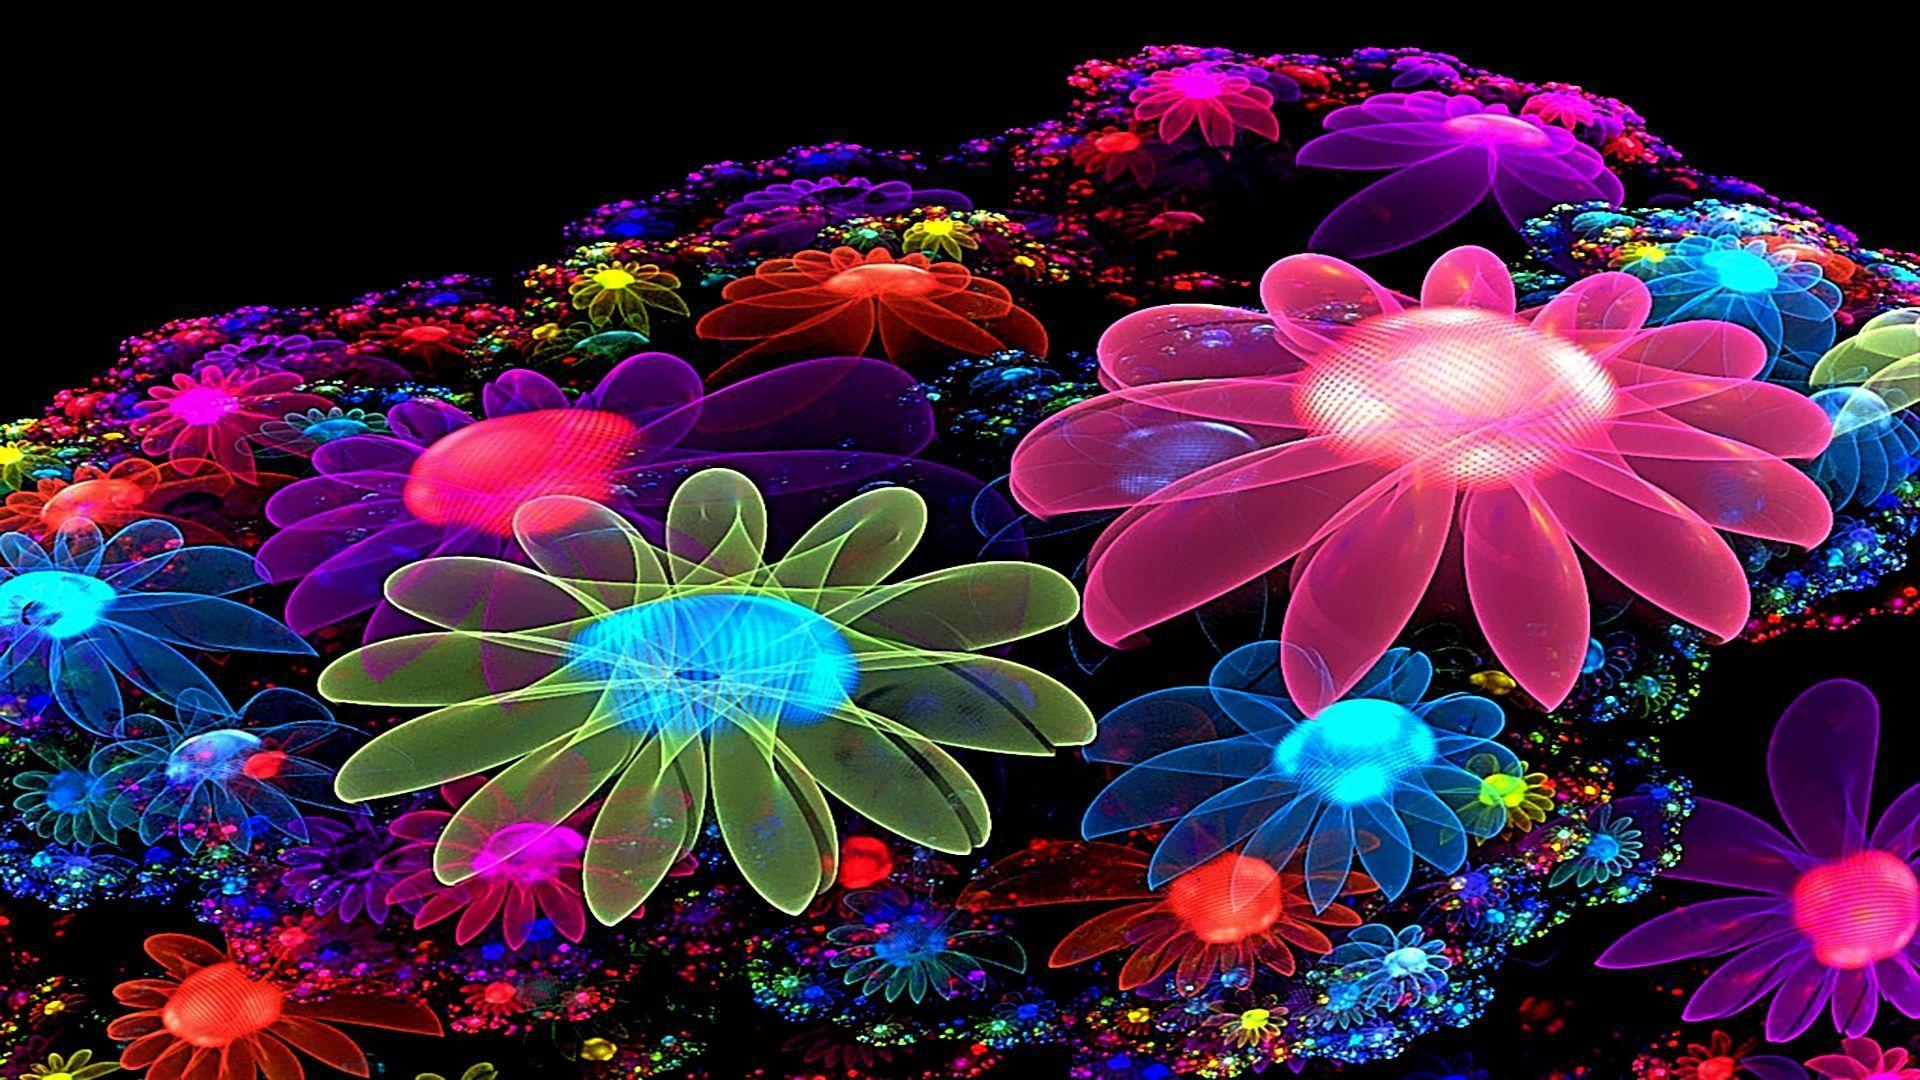 Beautiful Flower Wallpapers Mobile Phone Flowers Healthy